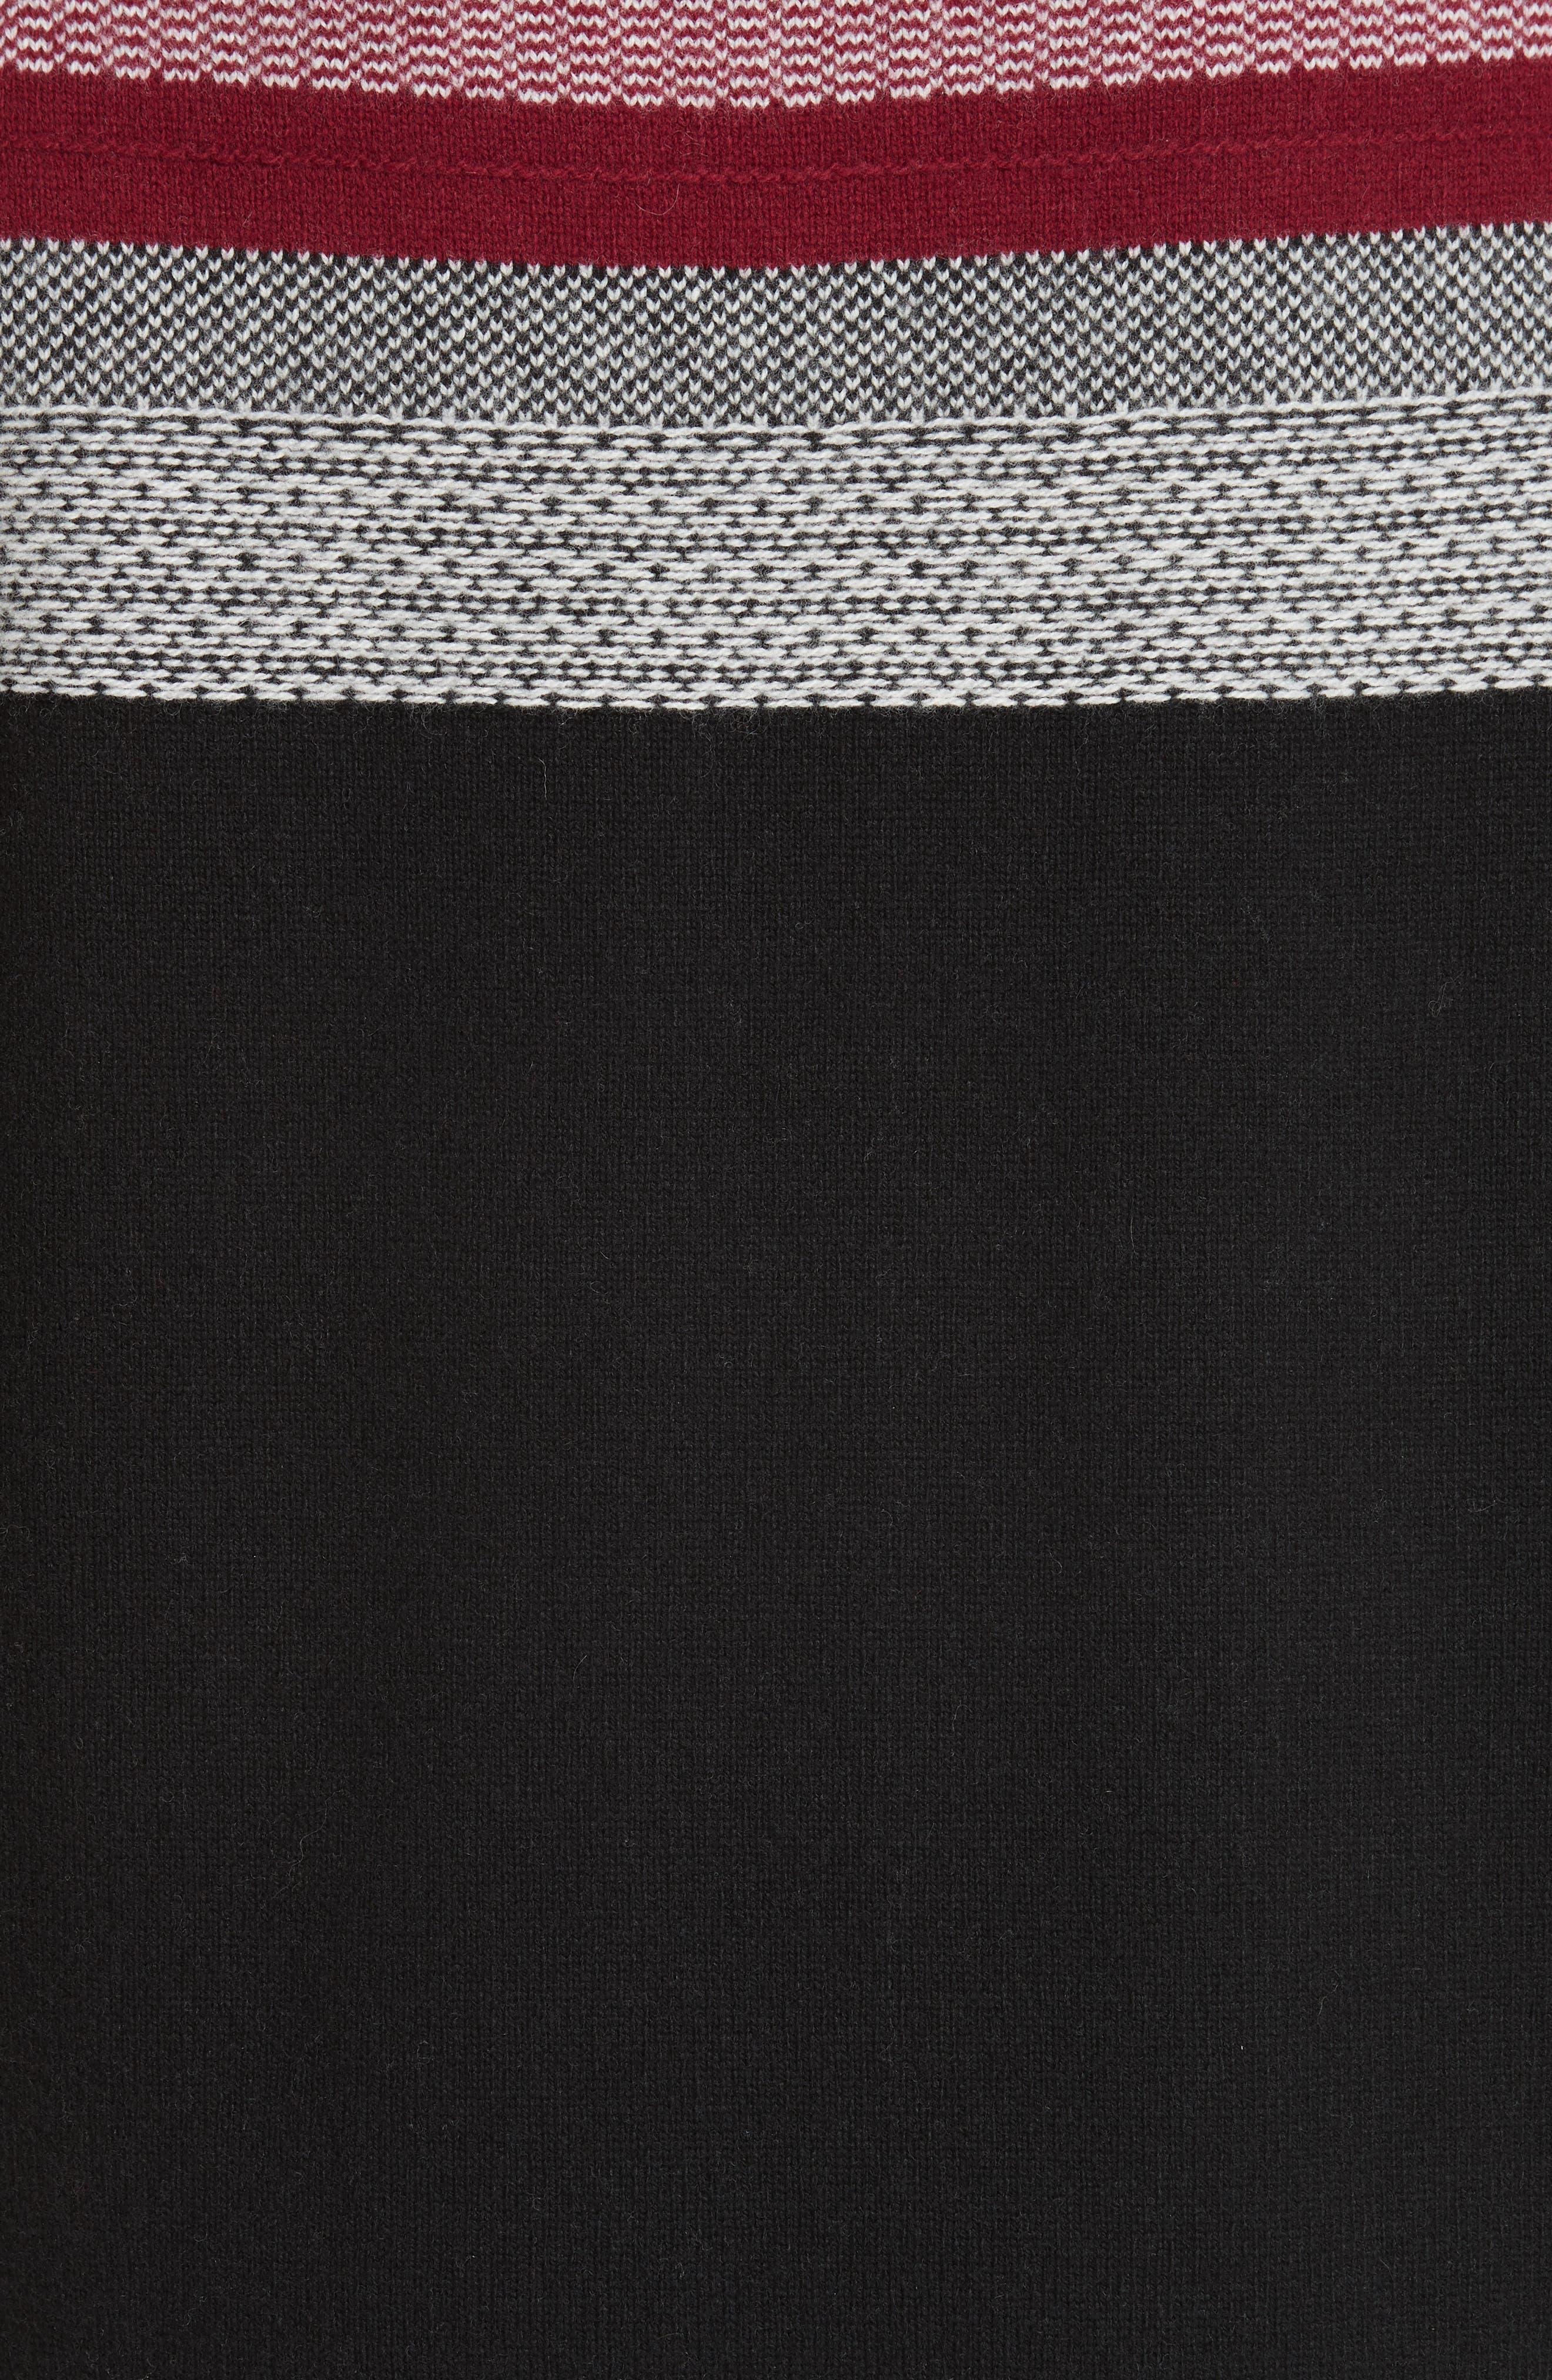 Fair Isle Merino Wool Blend Sweater,                             Alternate thumbnail 5, color,                             BLACK/ RED COMBO